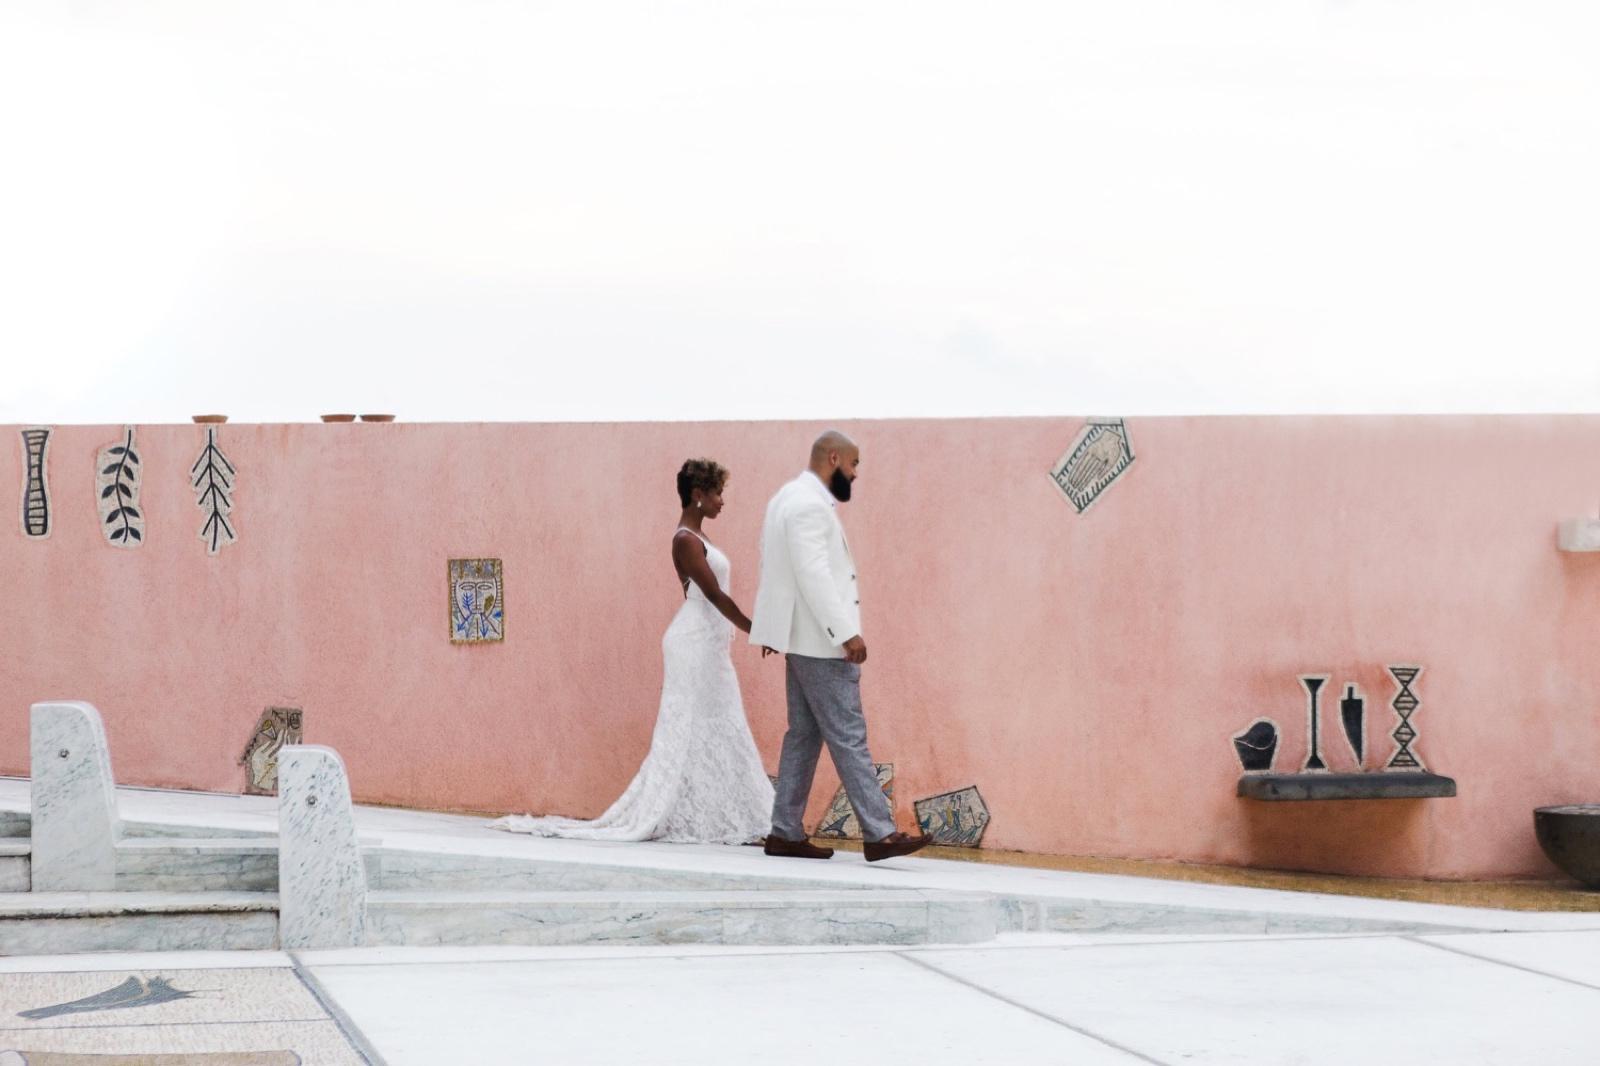 Fotomagoria Best 0f 2018 Wedding Photographer Italy91.jpg